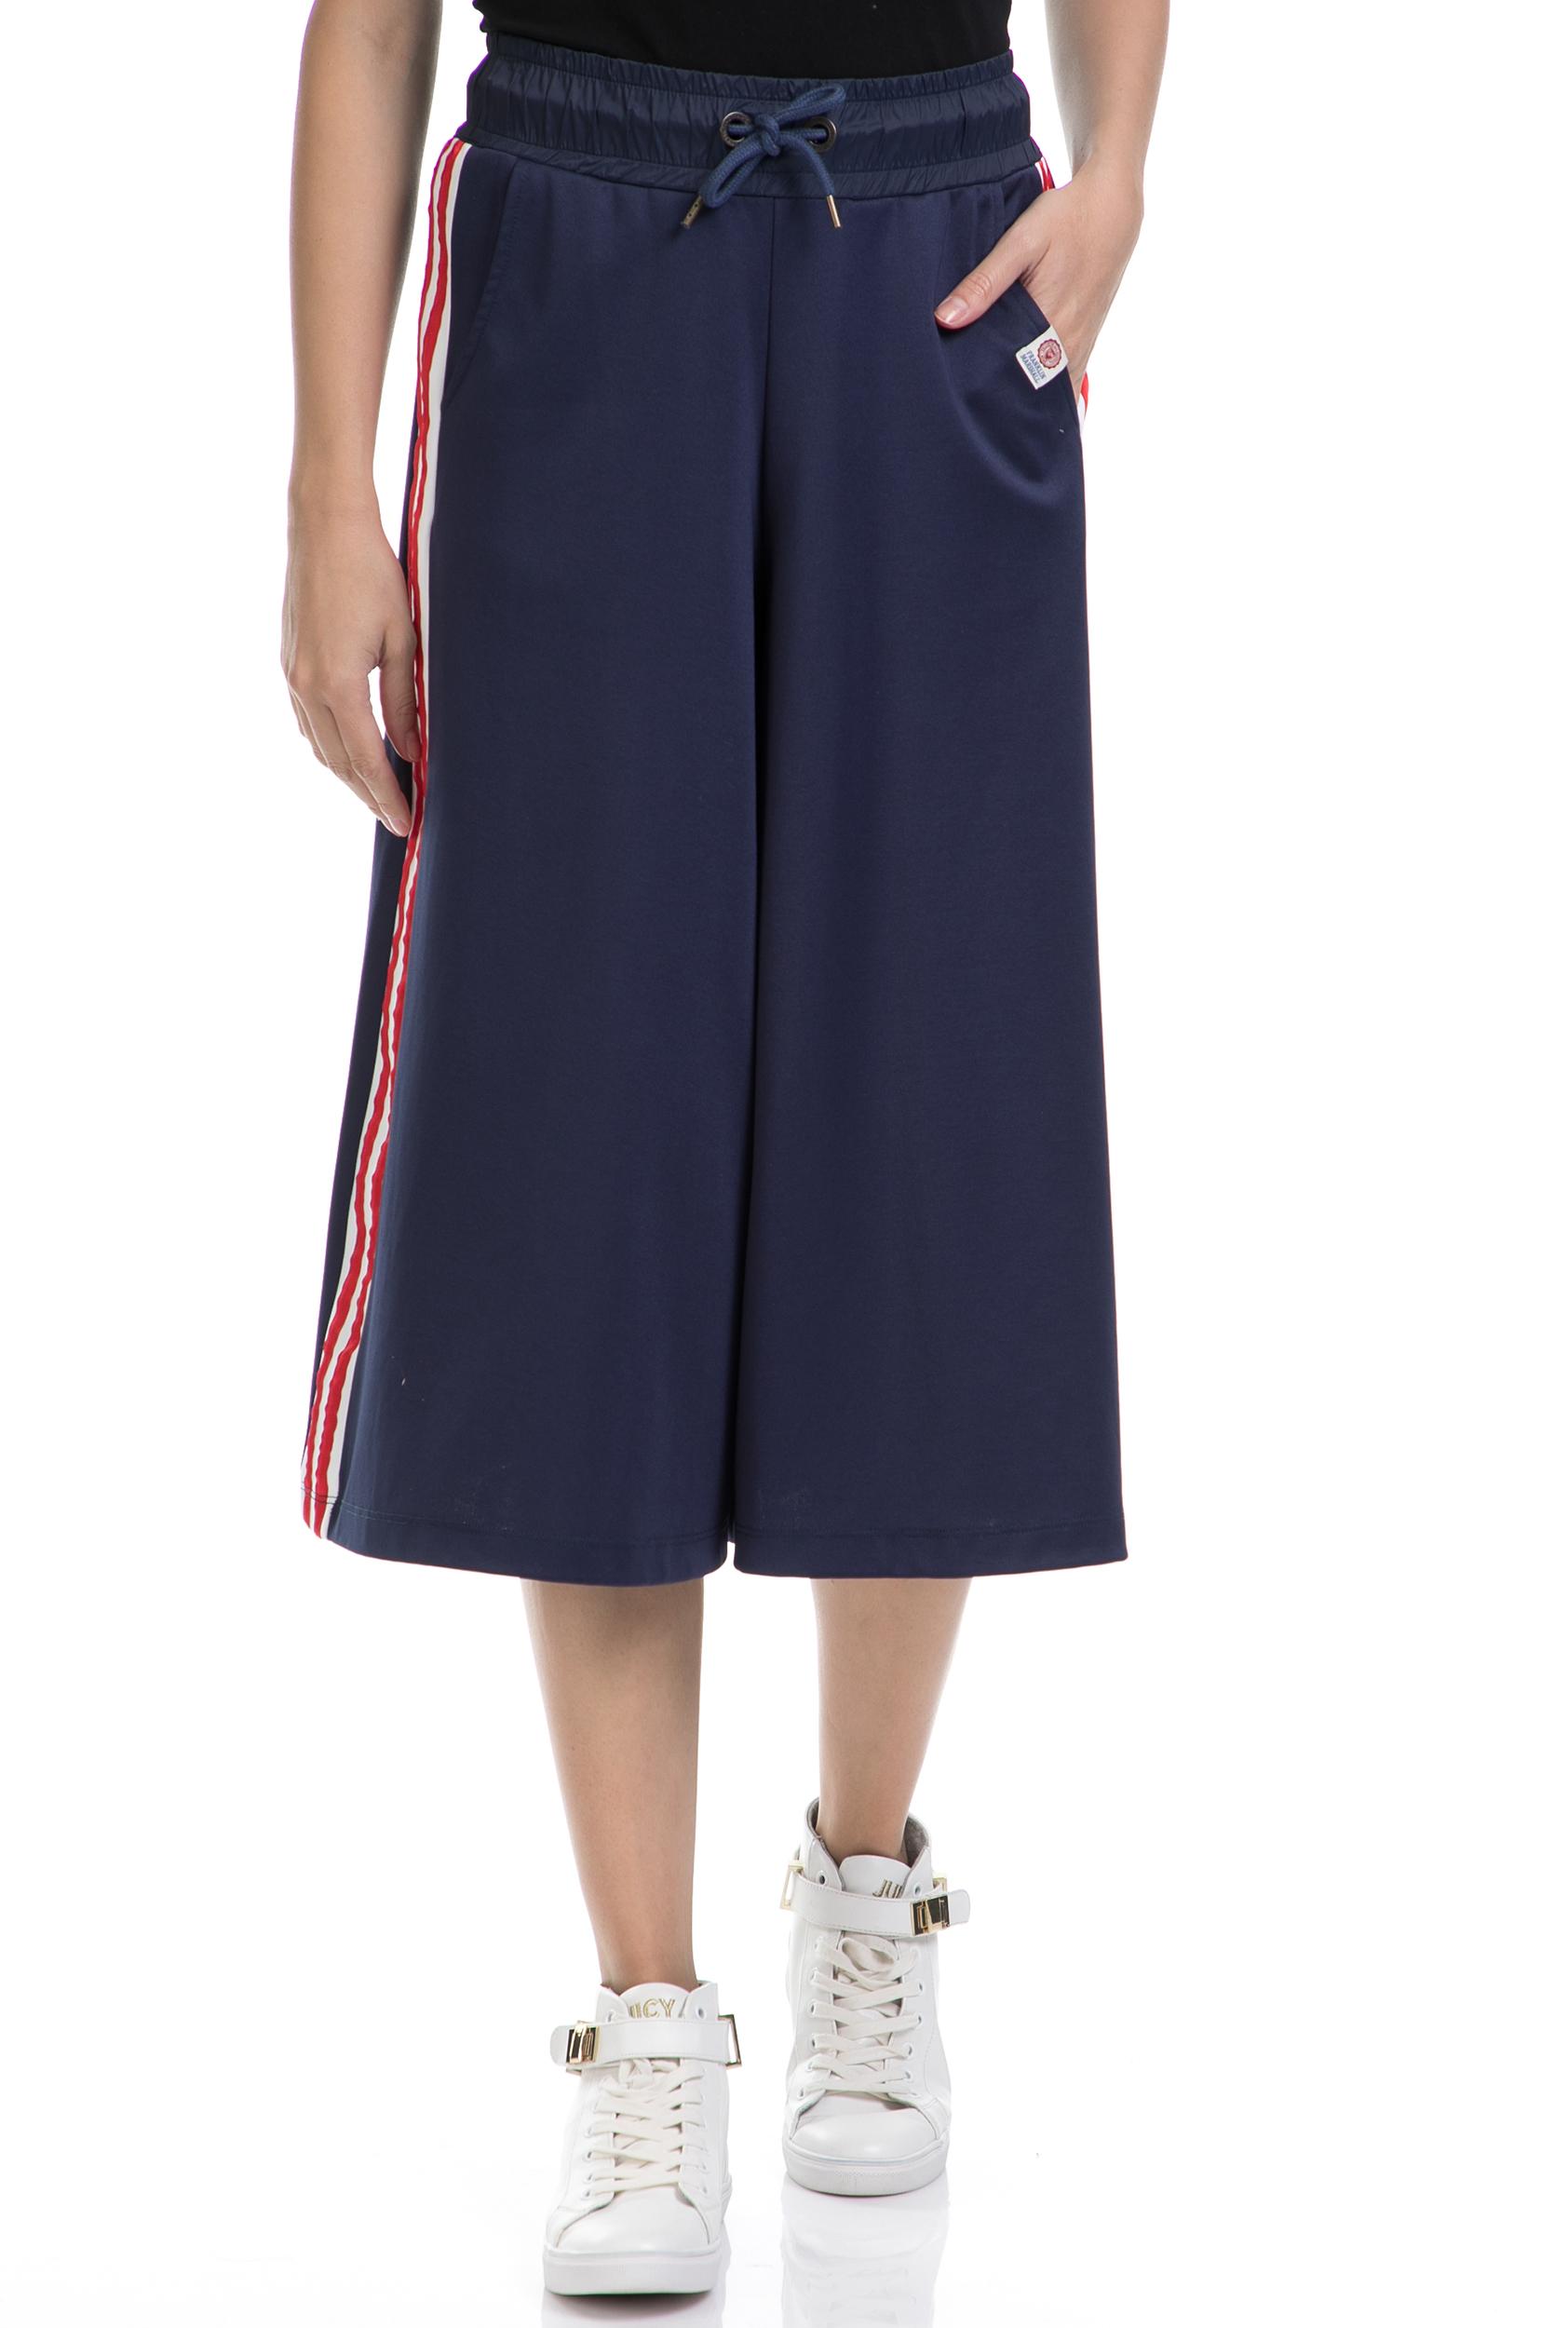 FRANKLIN & MARSHALL - Ζιπ κιλότ FRANKLIN & MARSHALL μπλε γυναικεία ρούχα παντελόνια cropped